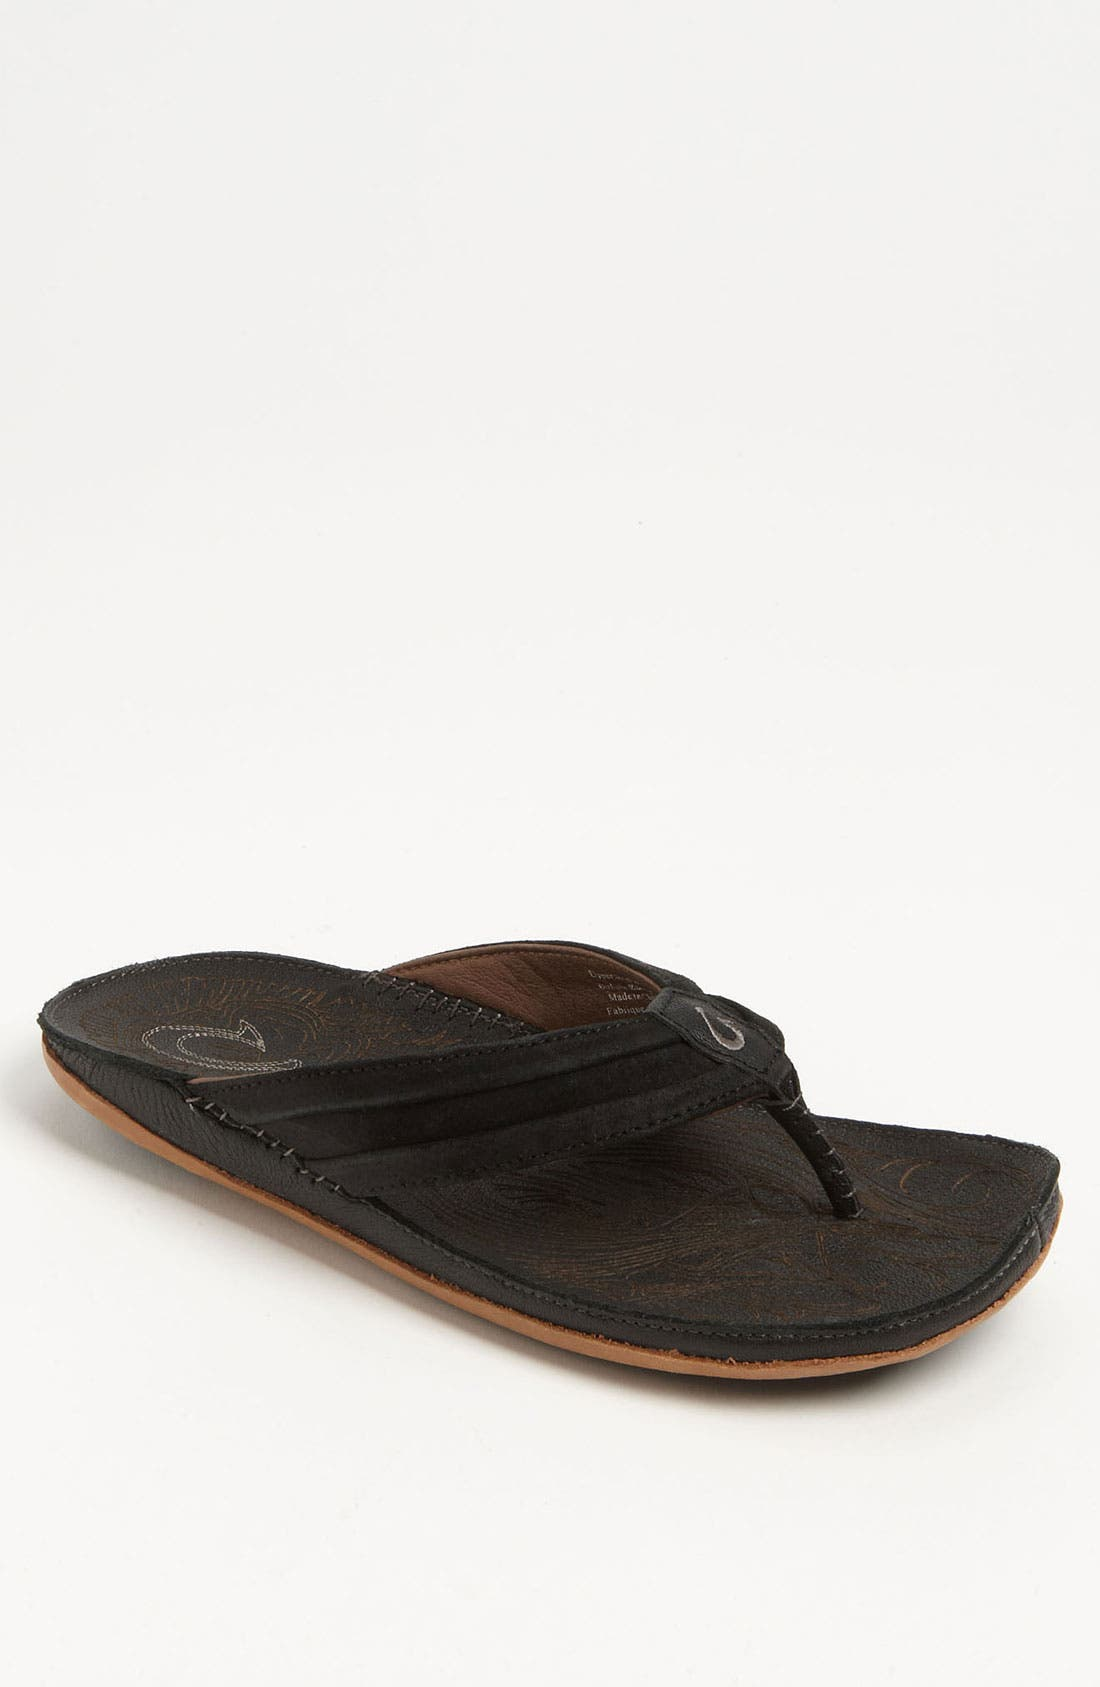 Alternate Image 1 Selected - OluKai 'Kava' Flip Flop (Men)